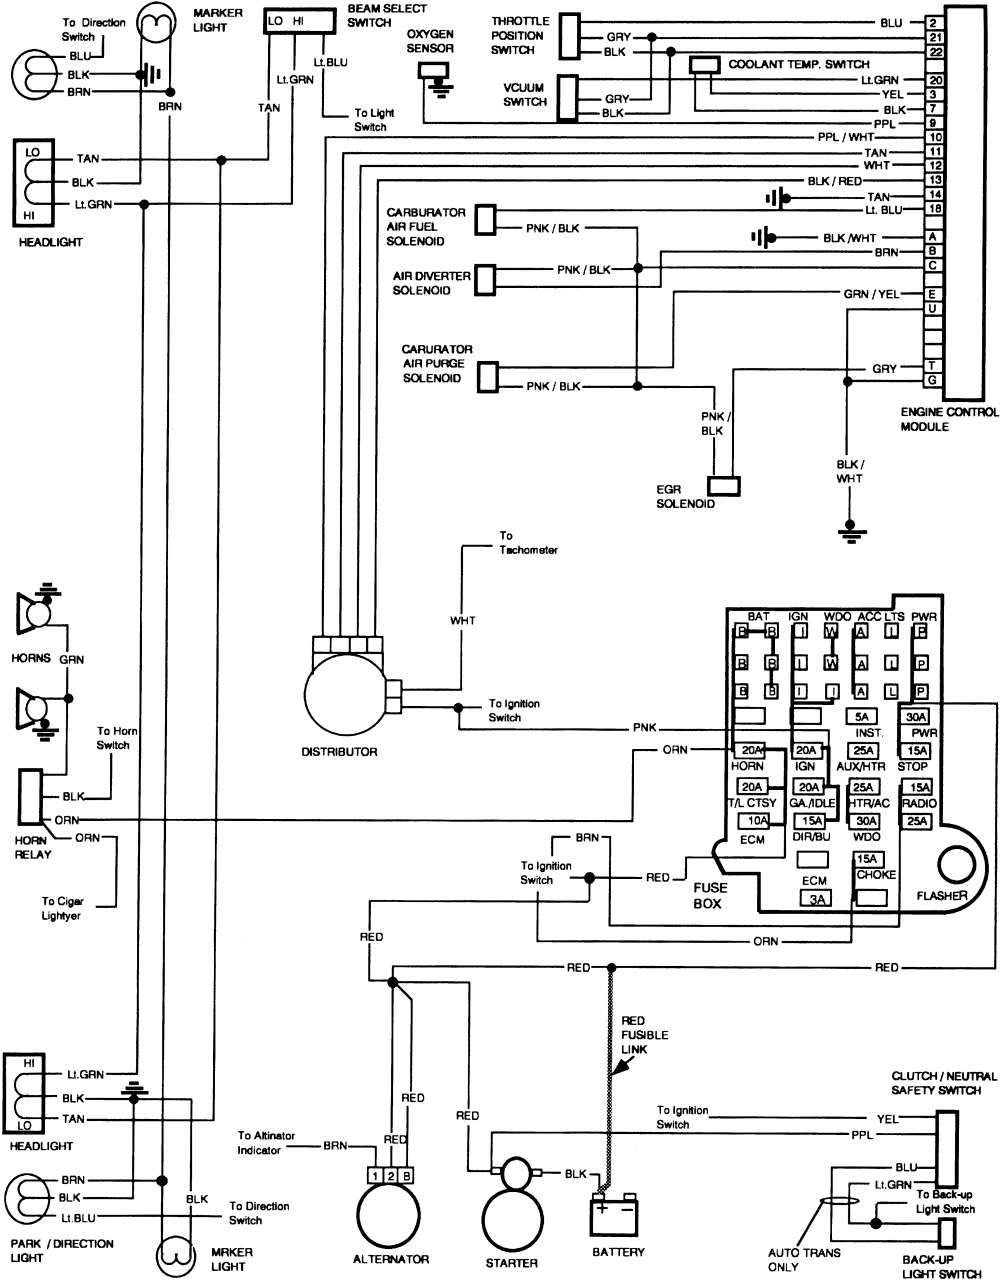 wiring diagram cars trucks wiring diagram cars trucks truck horn 1986 chevy truck horn wiring diagram chevy truck horn wiring [ 1000 x 1280 Pixel ]